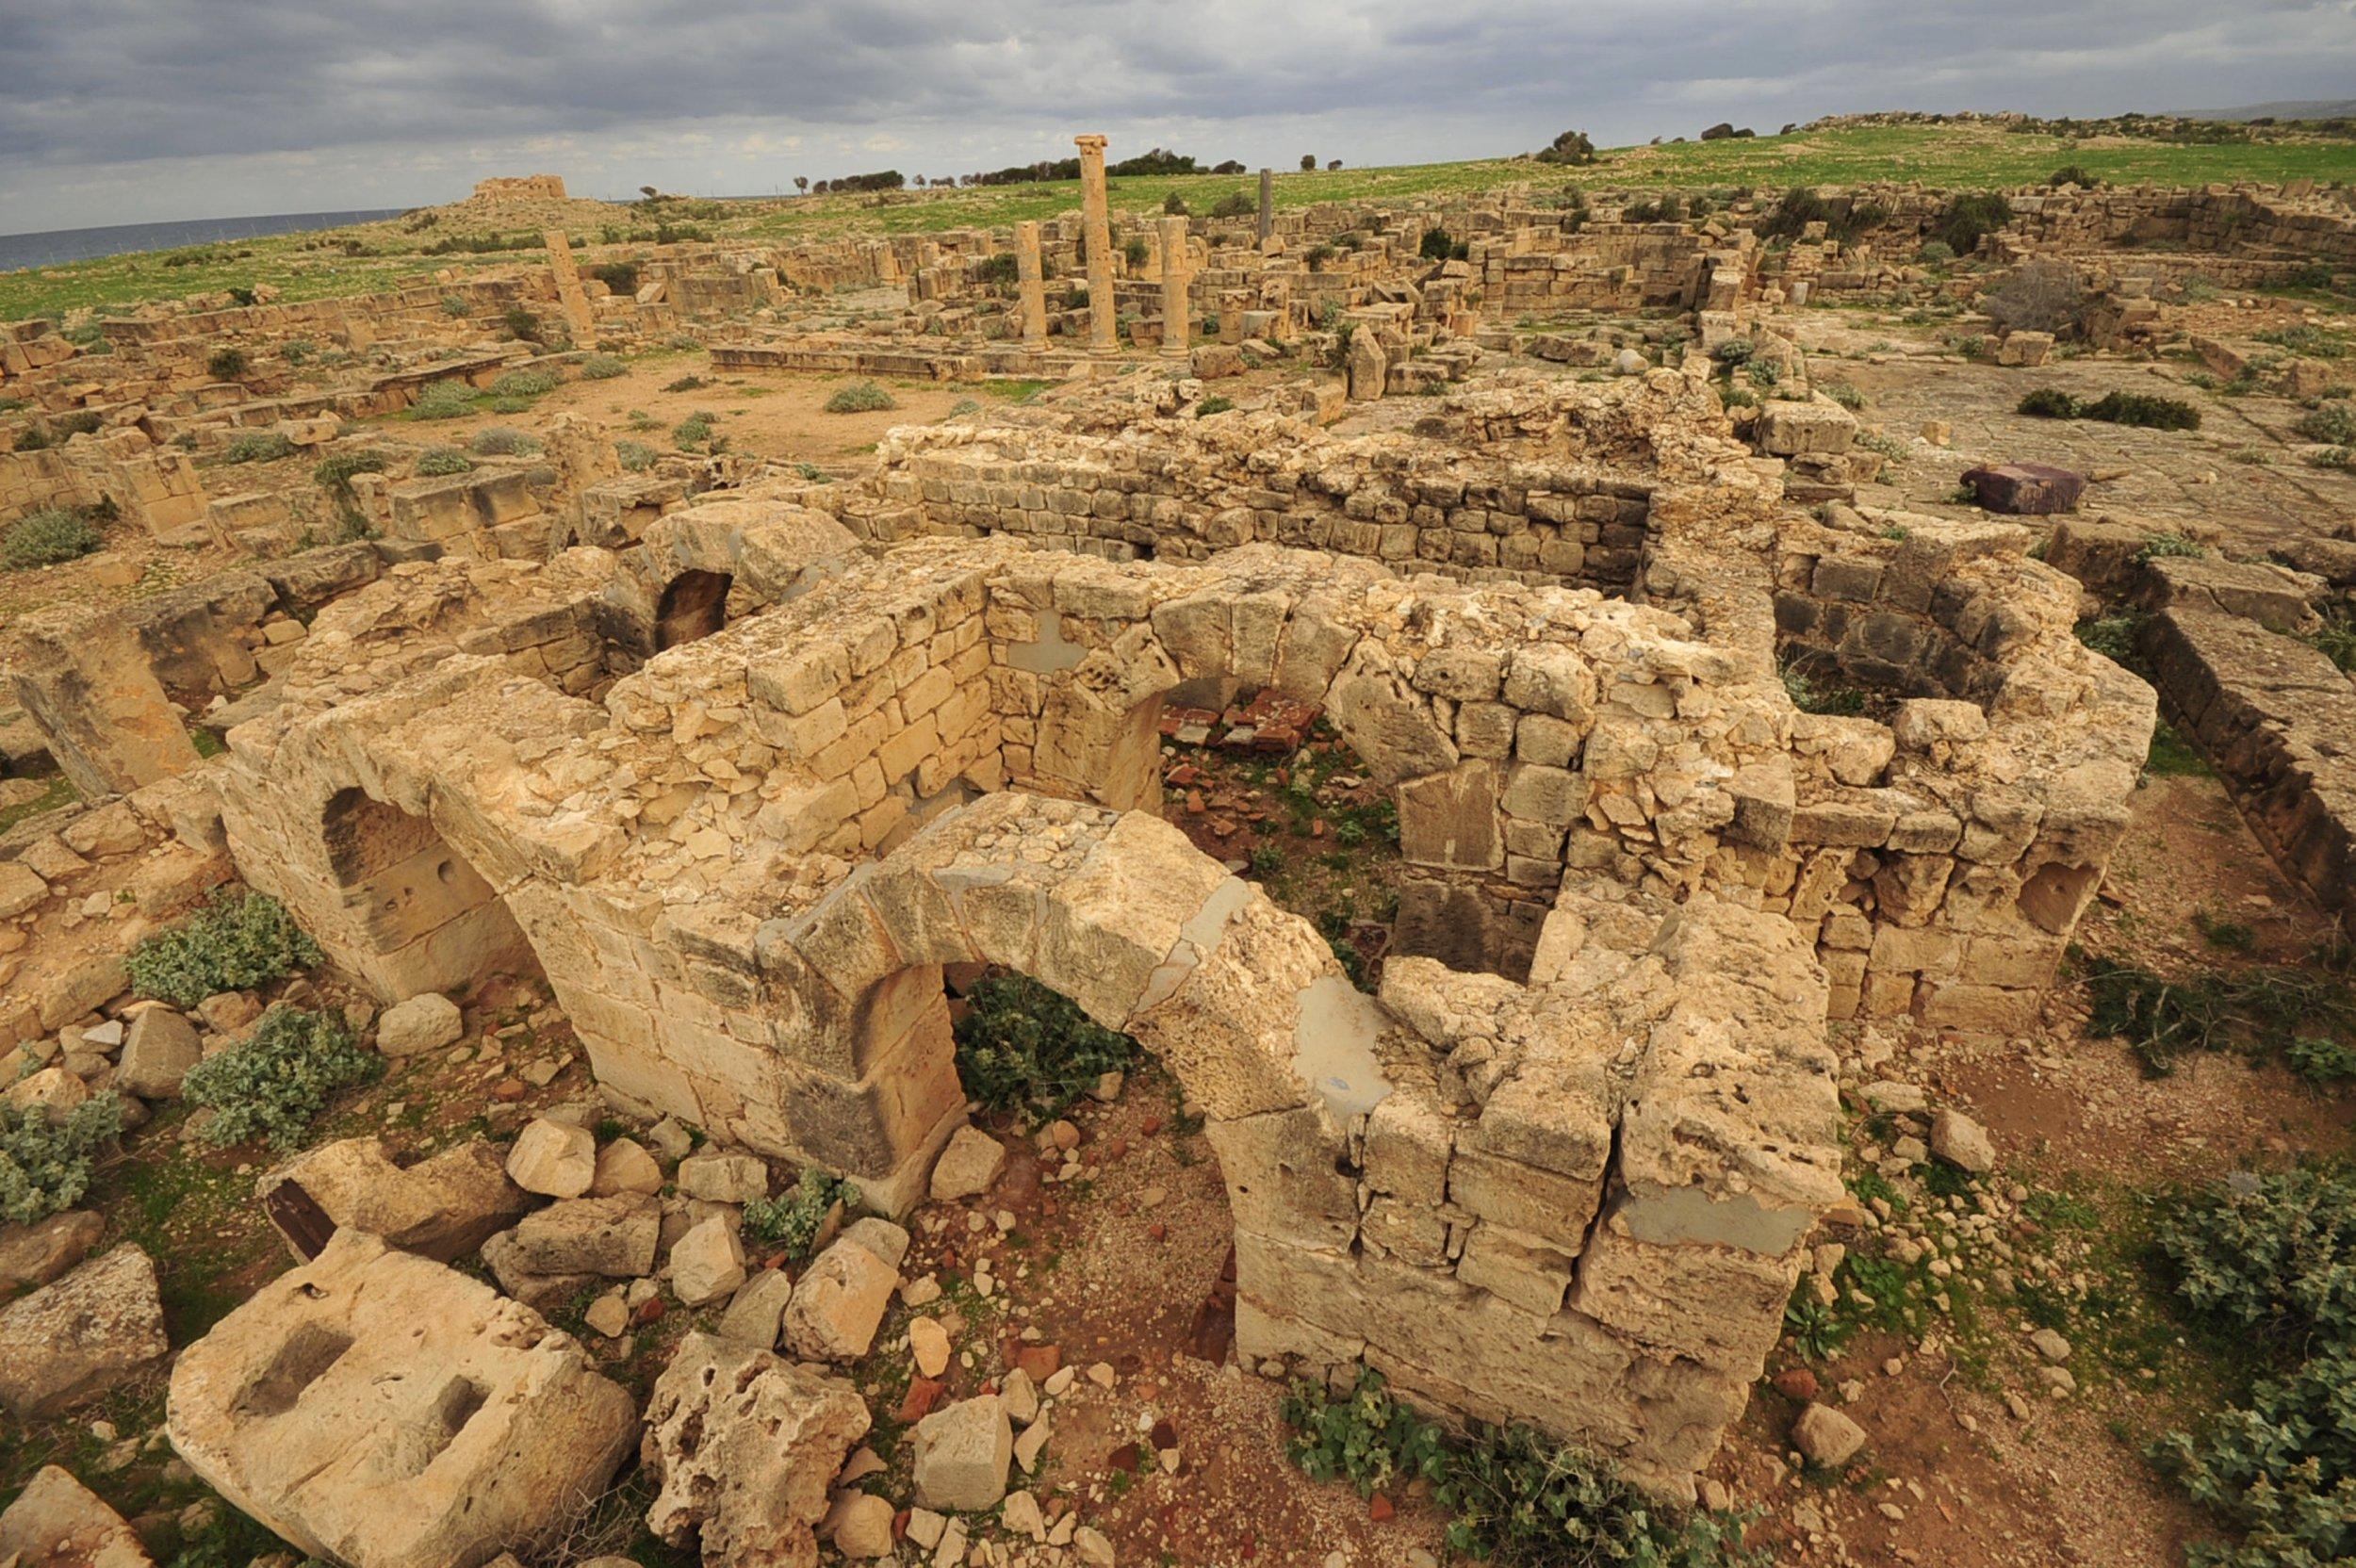 A part of the ancient city of Ptolemais, Libya